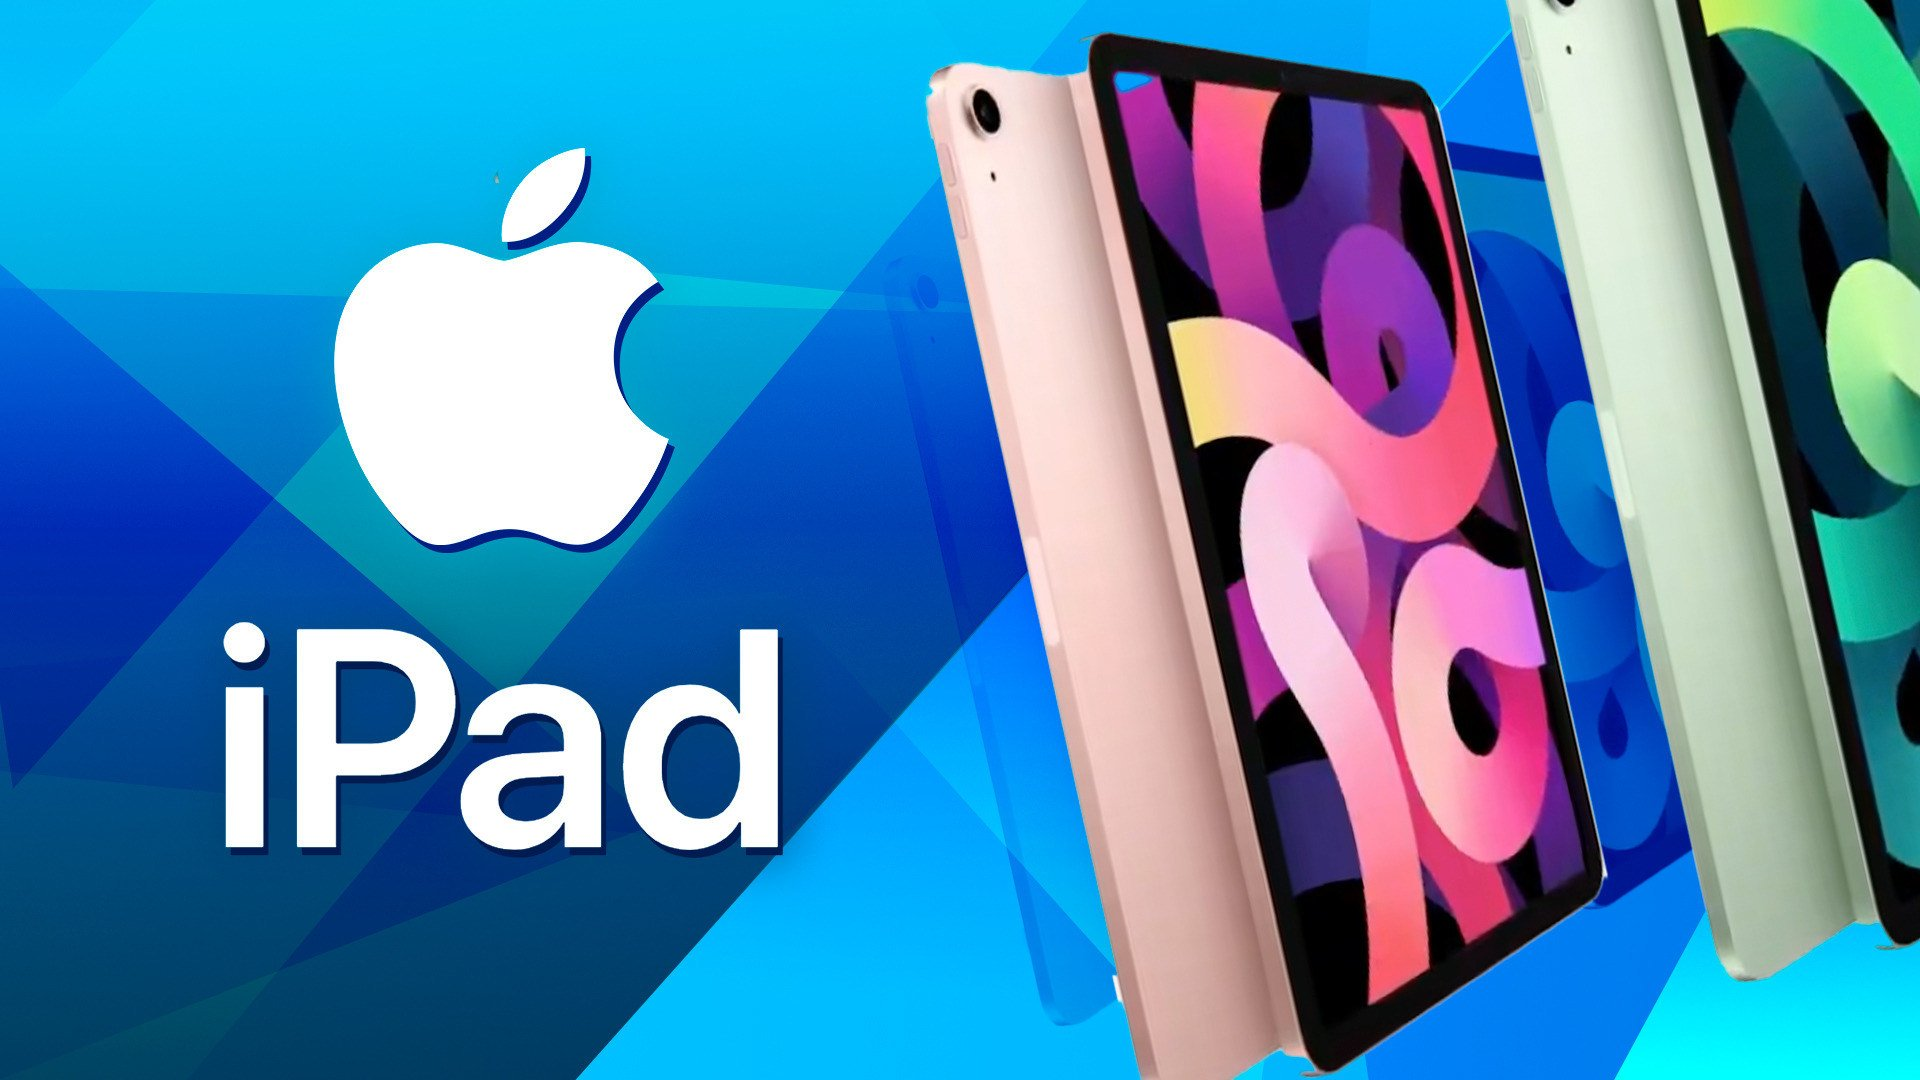 Apple, Tablet, Logo, Ipad, Apple Ipad, ipad pro, iPad mini, iPad air, iPadOS, Apple iPad Pro, Apple iPad air, Apple iPad mini, Apple iPadOS